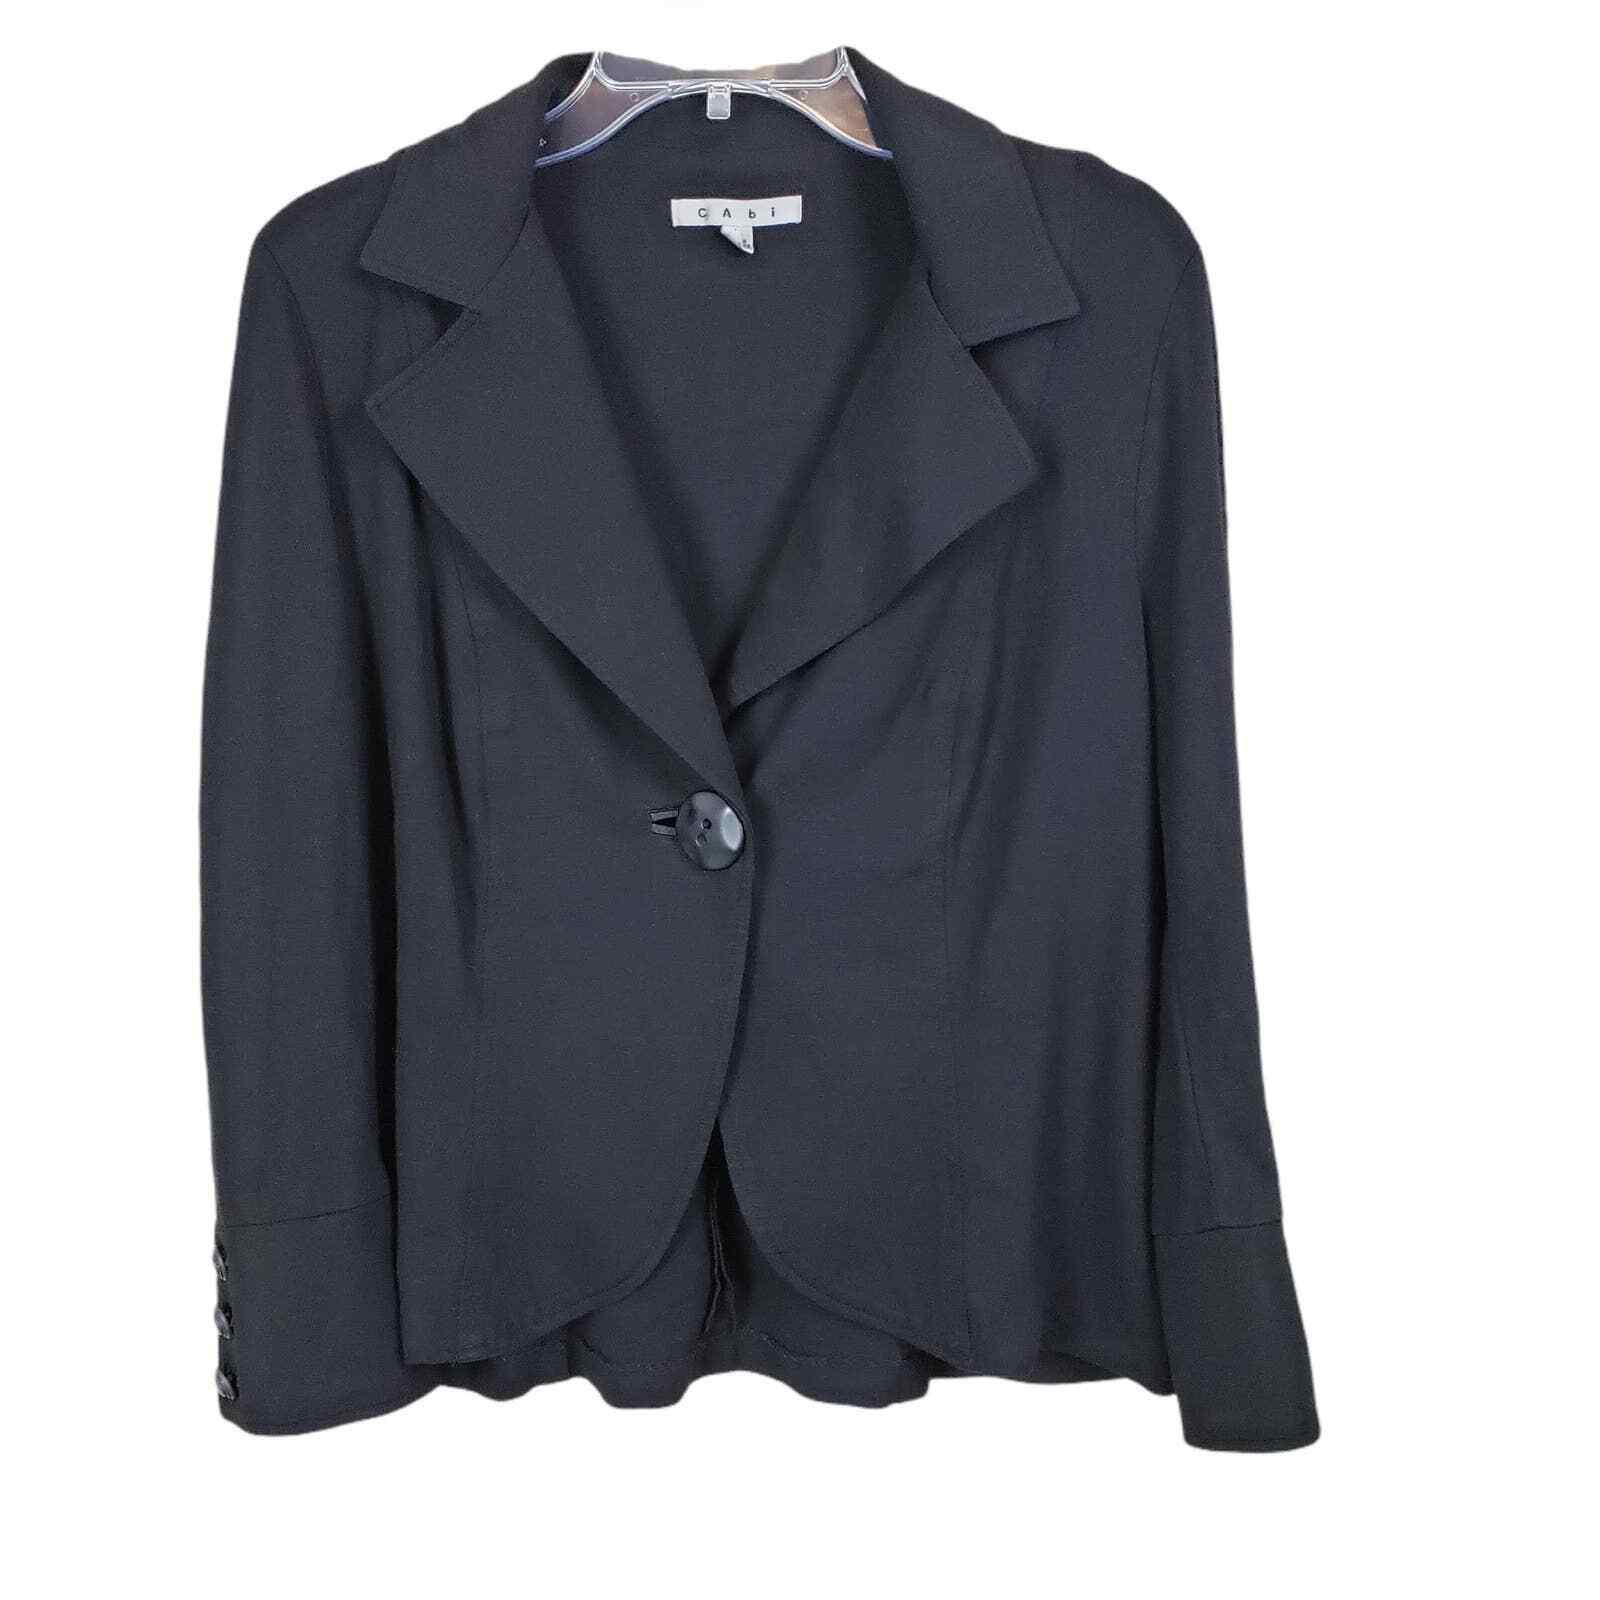 Cabi Women's Black Long Sleeve One Button Collared Jersey Blazer Jacket Size L